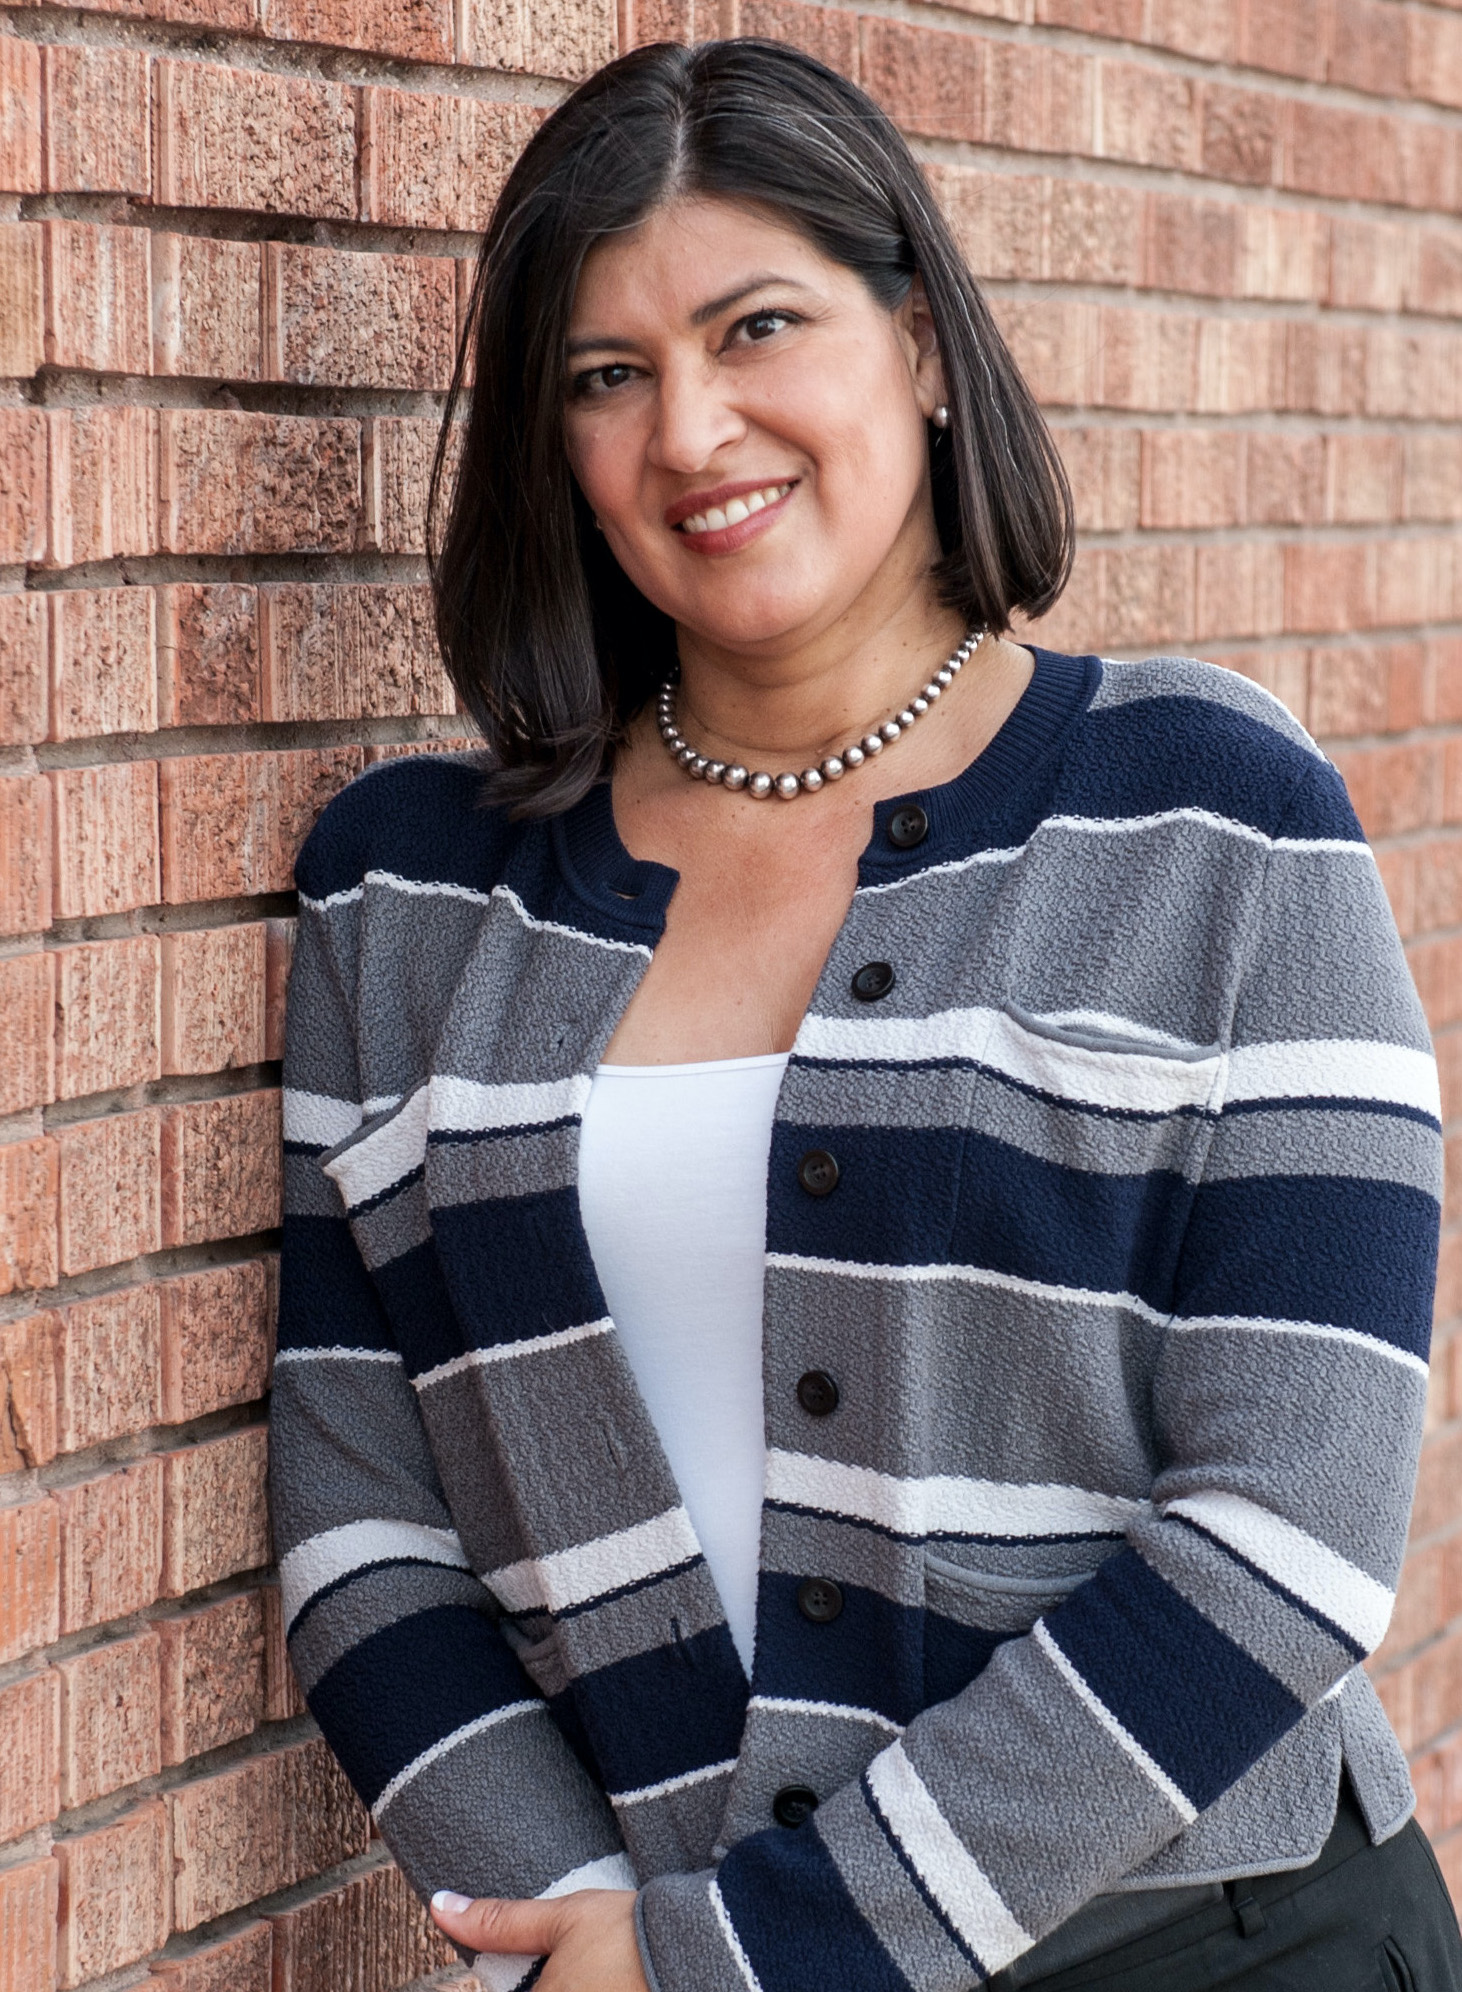 Angela Cabellero Tucson, AZ Ascension College Planning